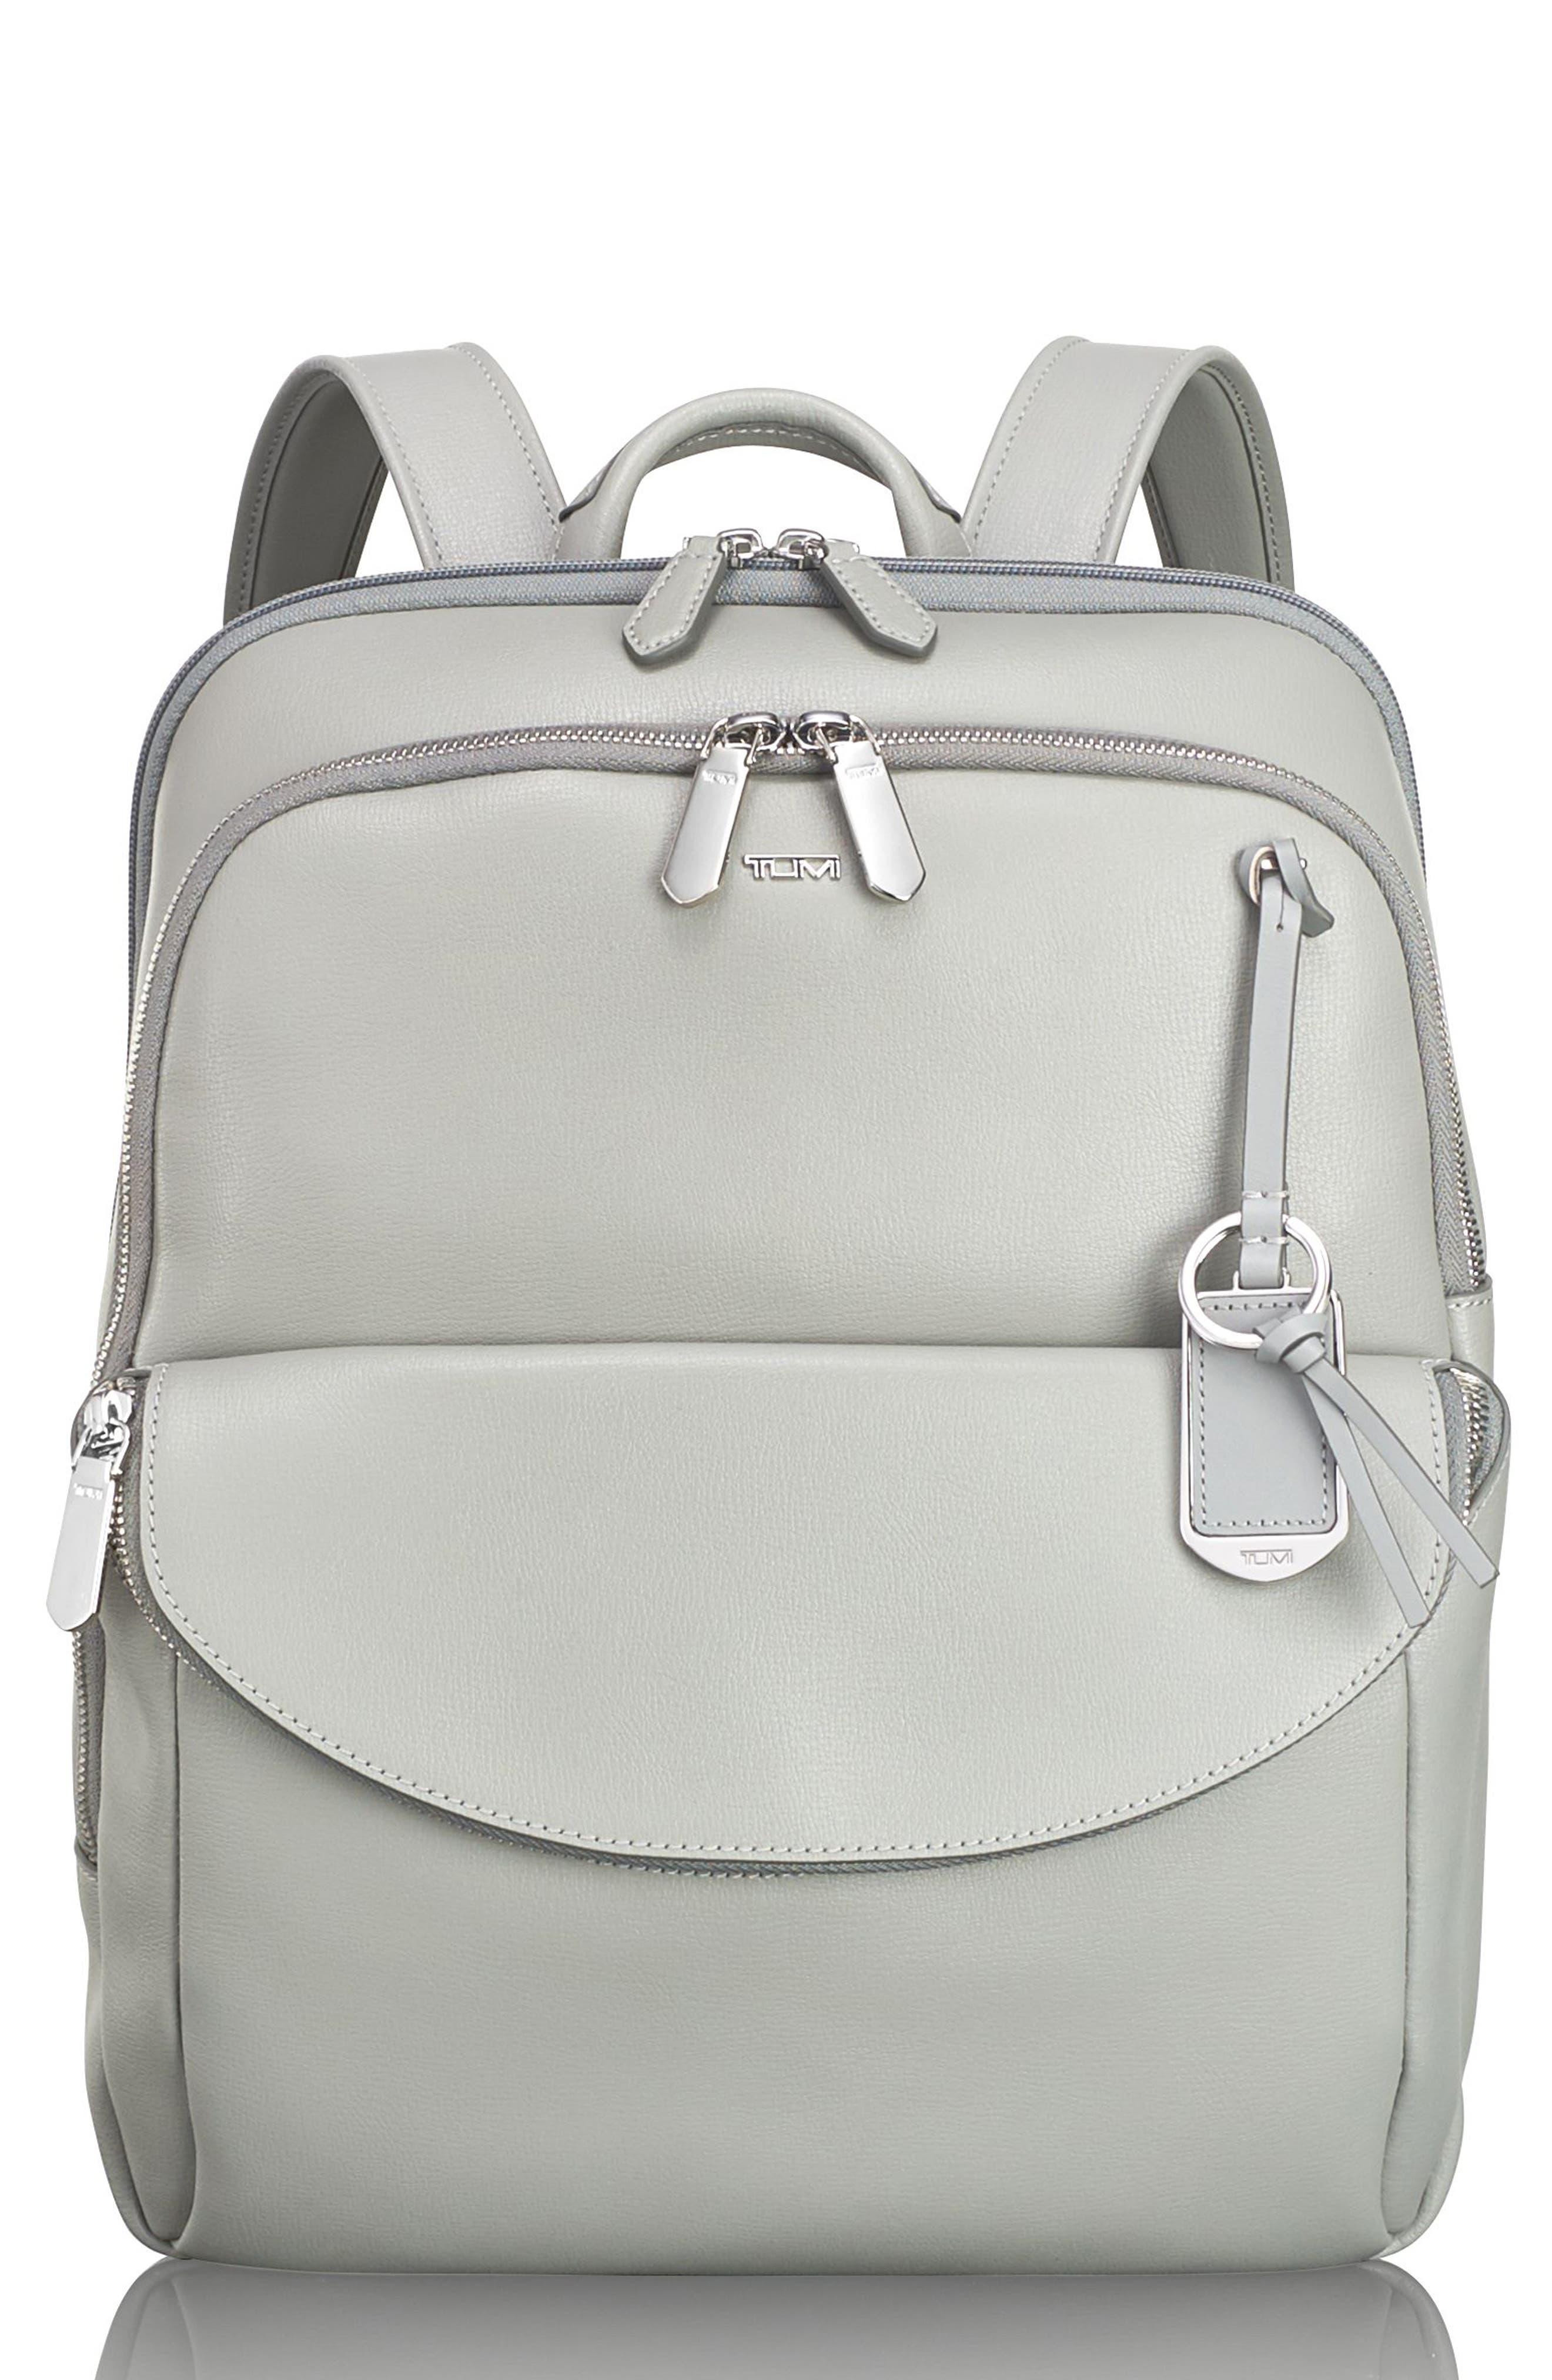 Tumi Stanton Hettie Leather Backpack